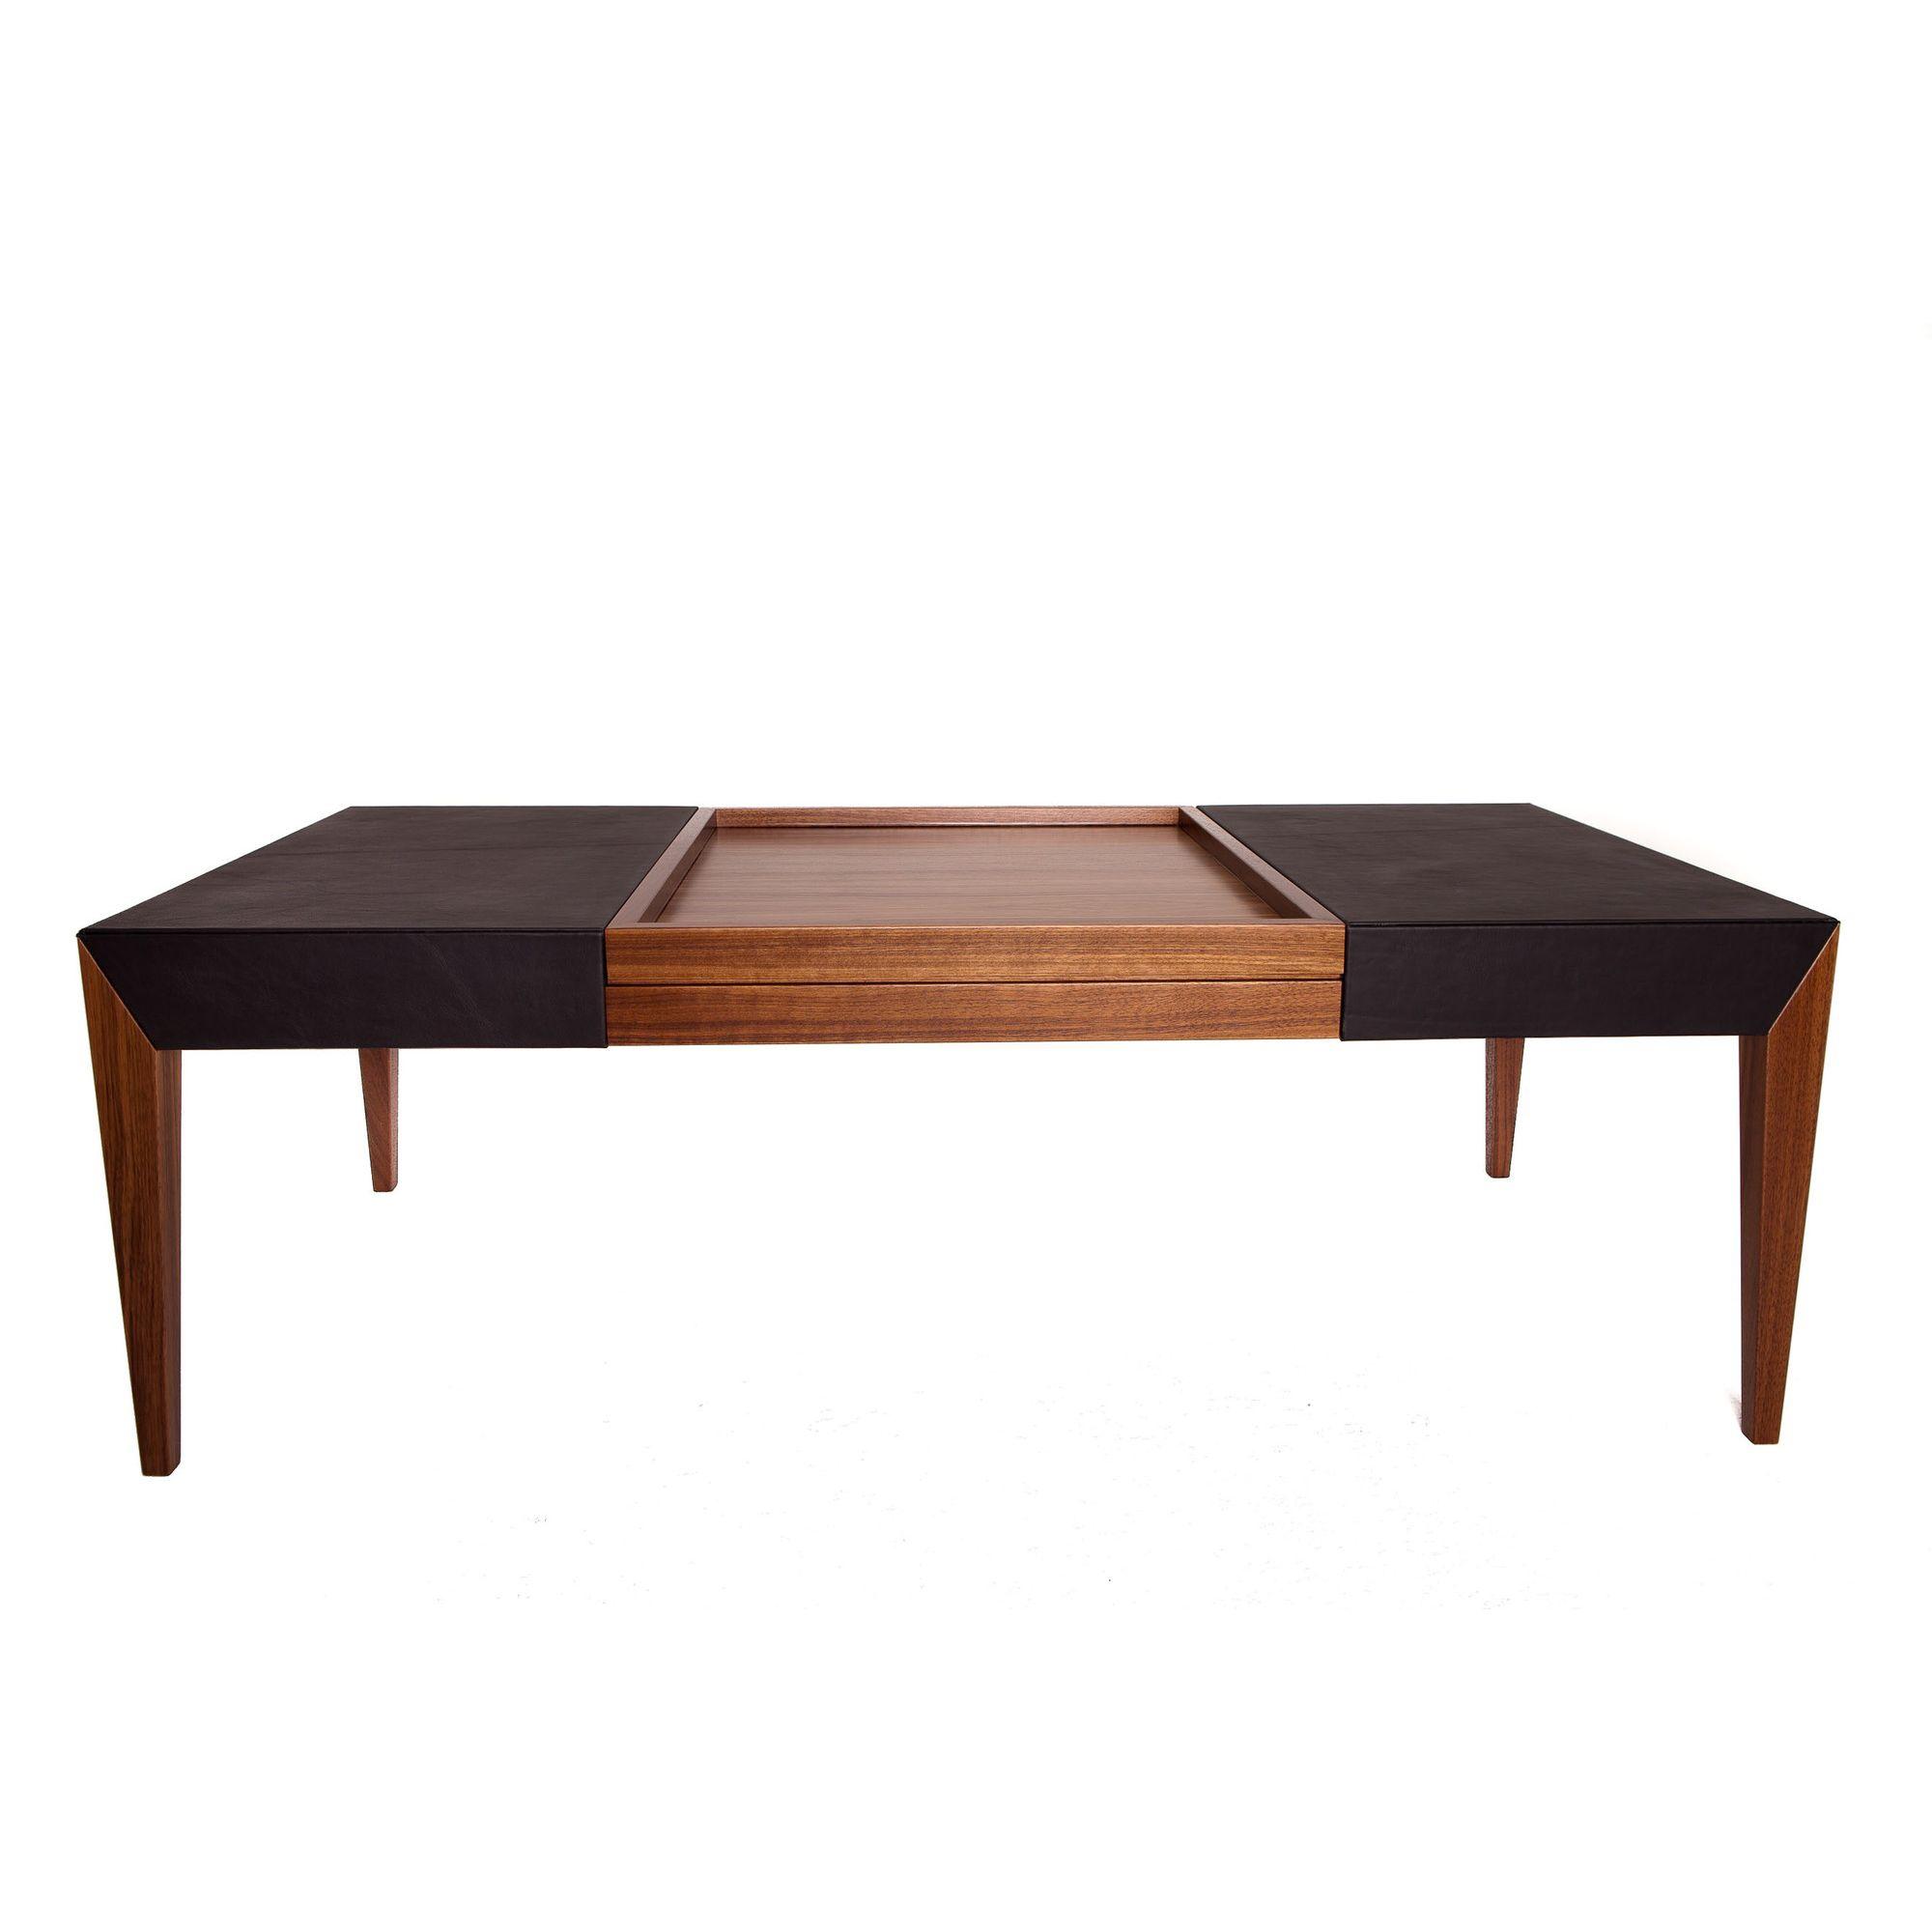 Novita Furniture Design Verdi Coffee Table at Tesco Direct